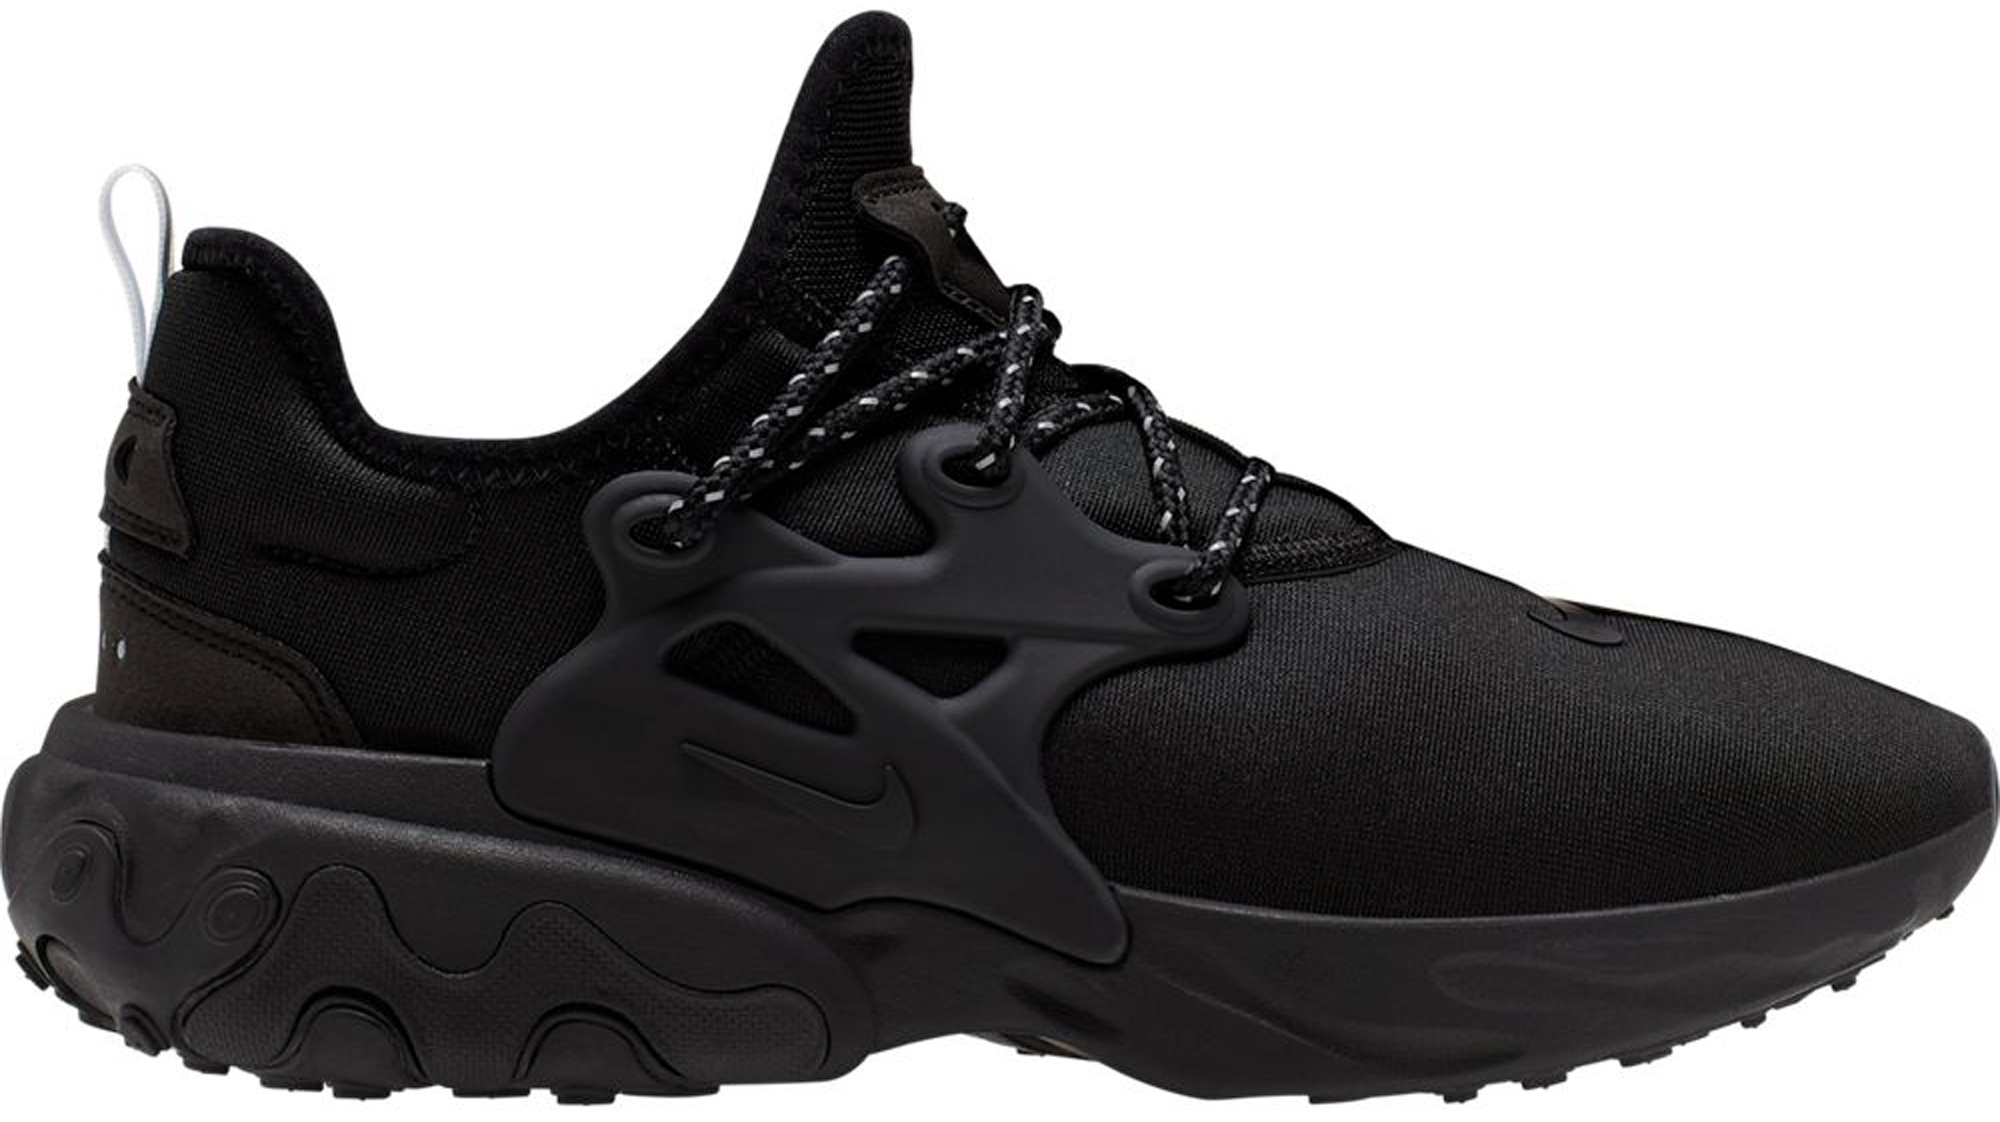 Nike React Presto Black Cat - AV2605-004